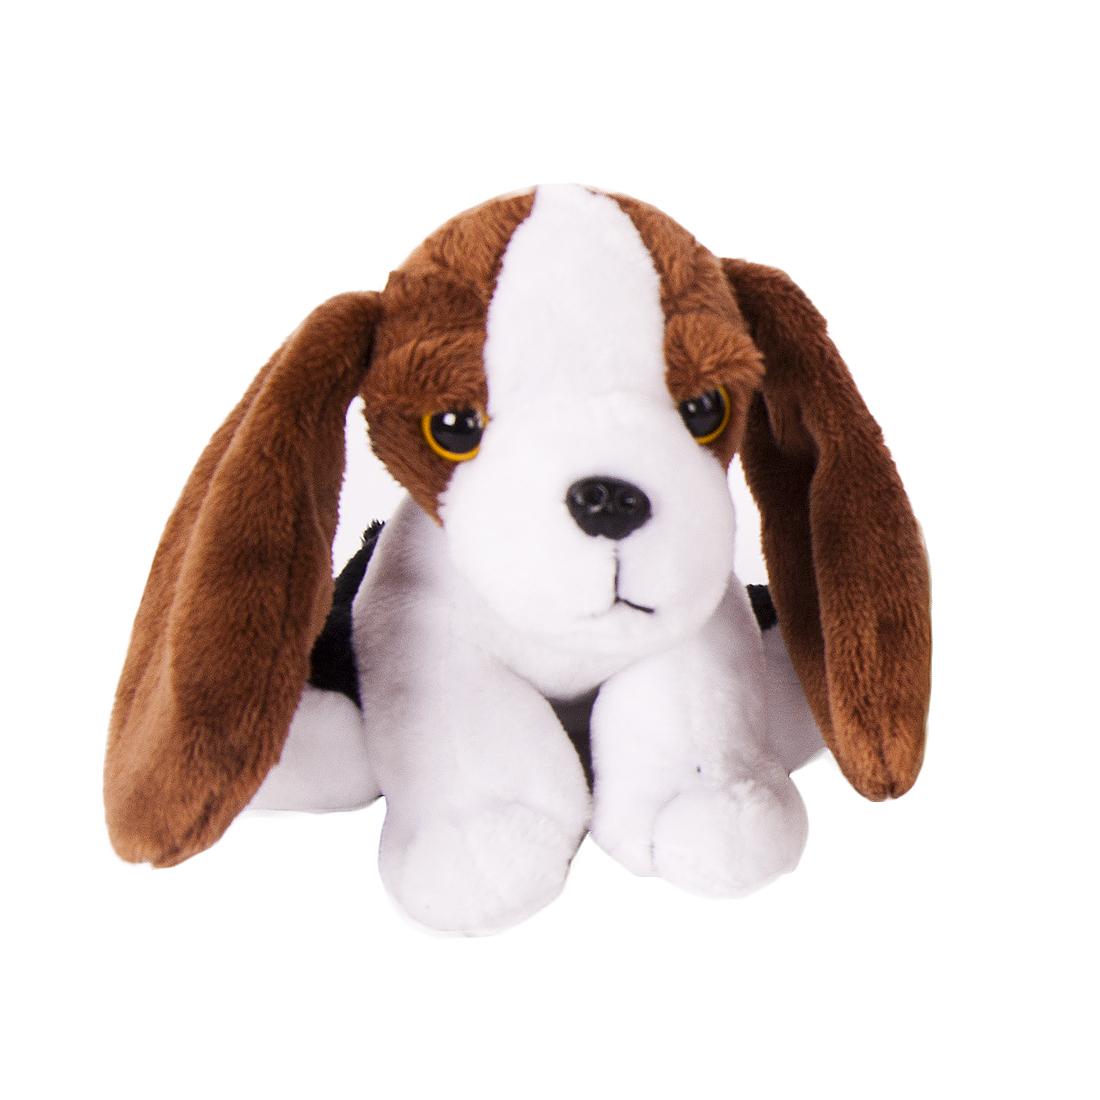 Мягкие игрушки Fluffy Family Щенок мягкие игрушки fluffy family мягкая игрушка щенок тилли